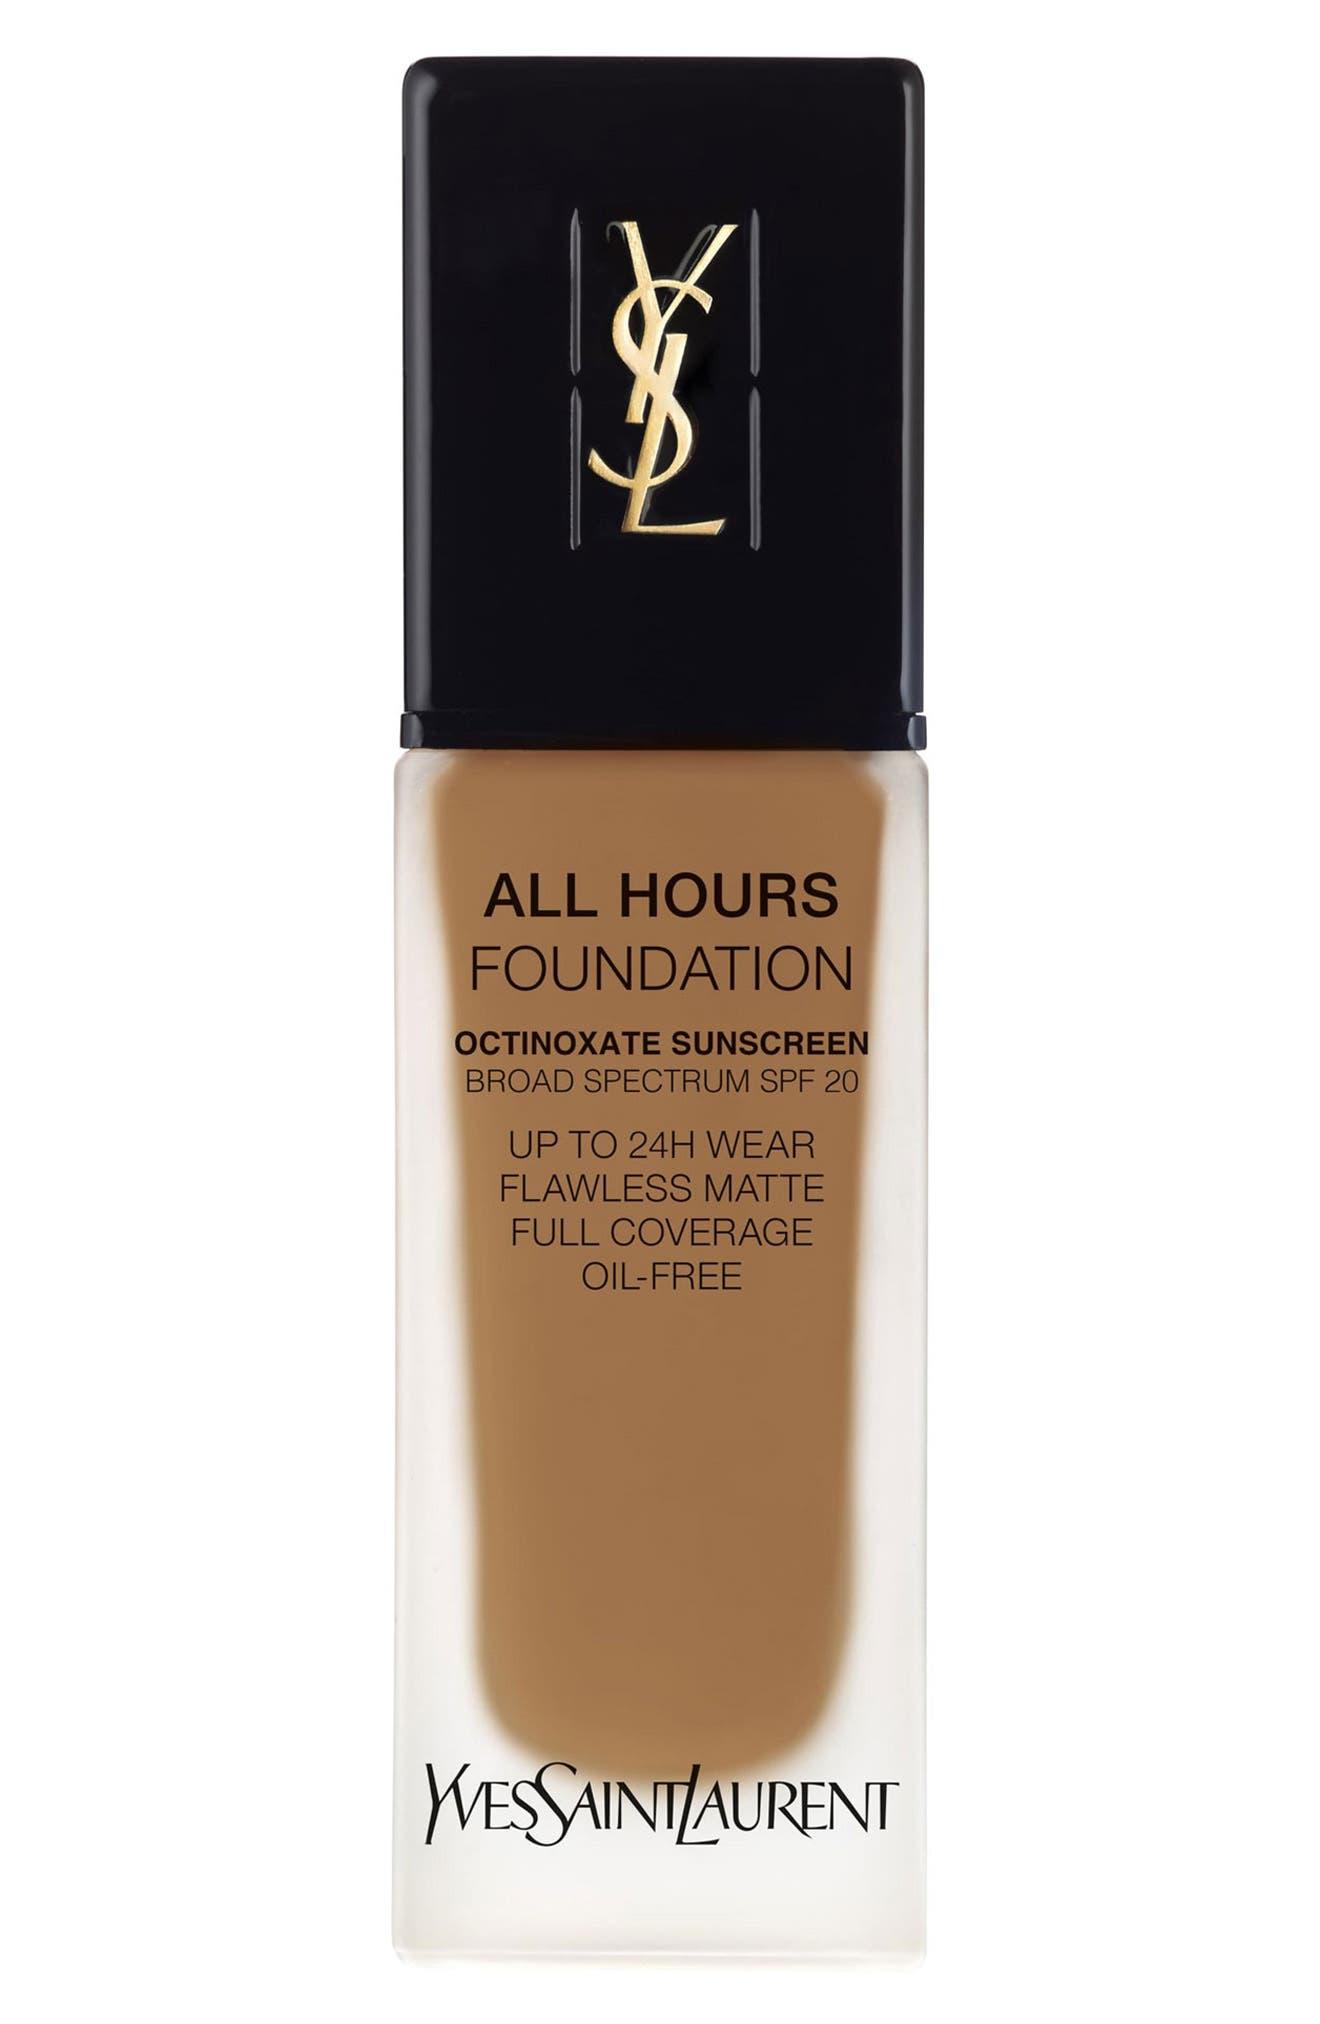 Yves Saint Laurent All Hours Full Coverage Matte Foundation Spf 20 - Bd75 Warm Hazelnut